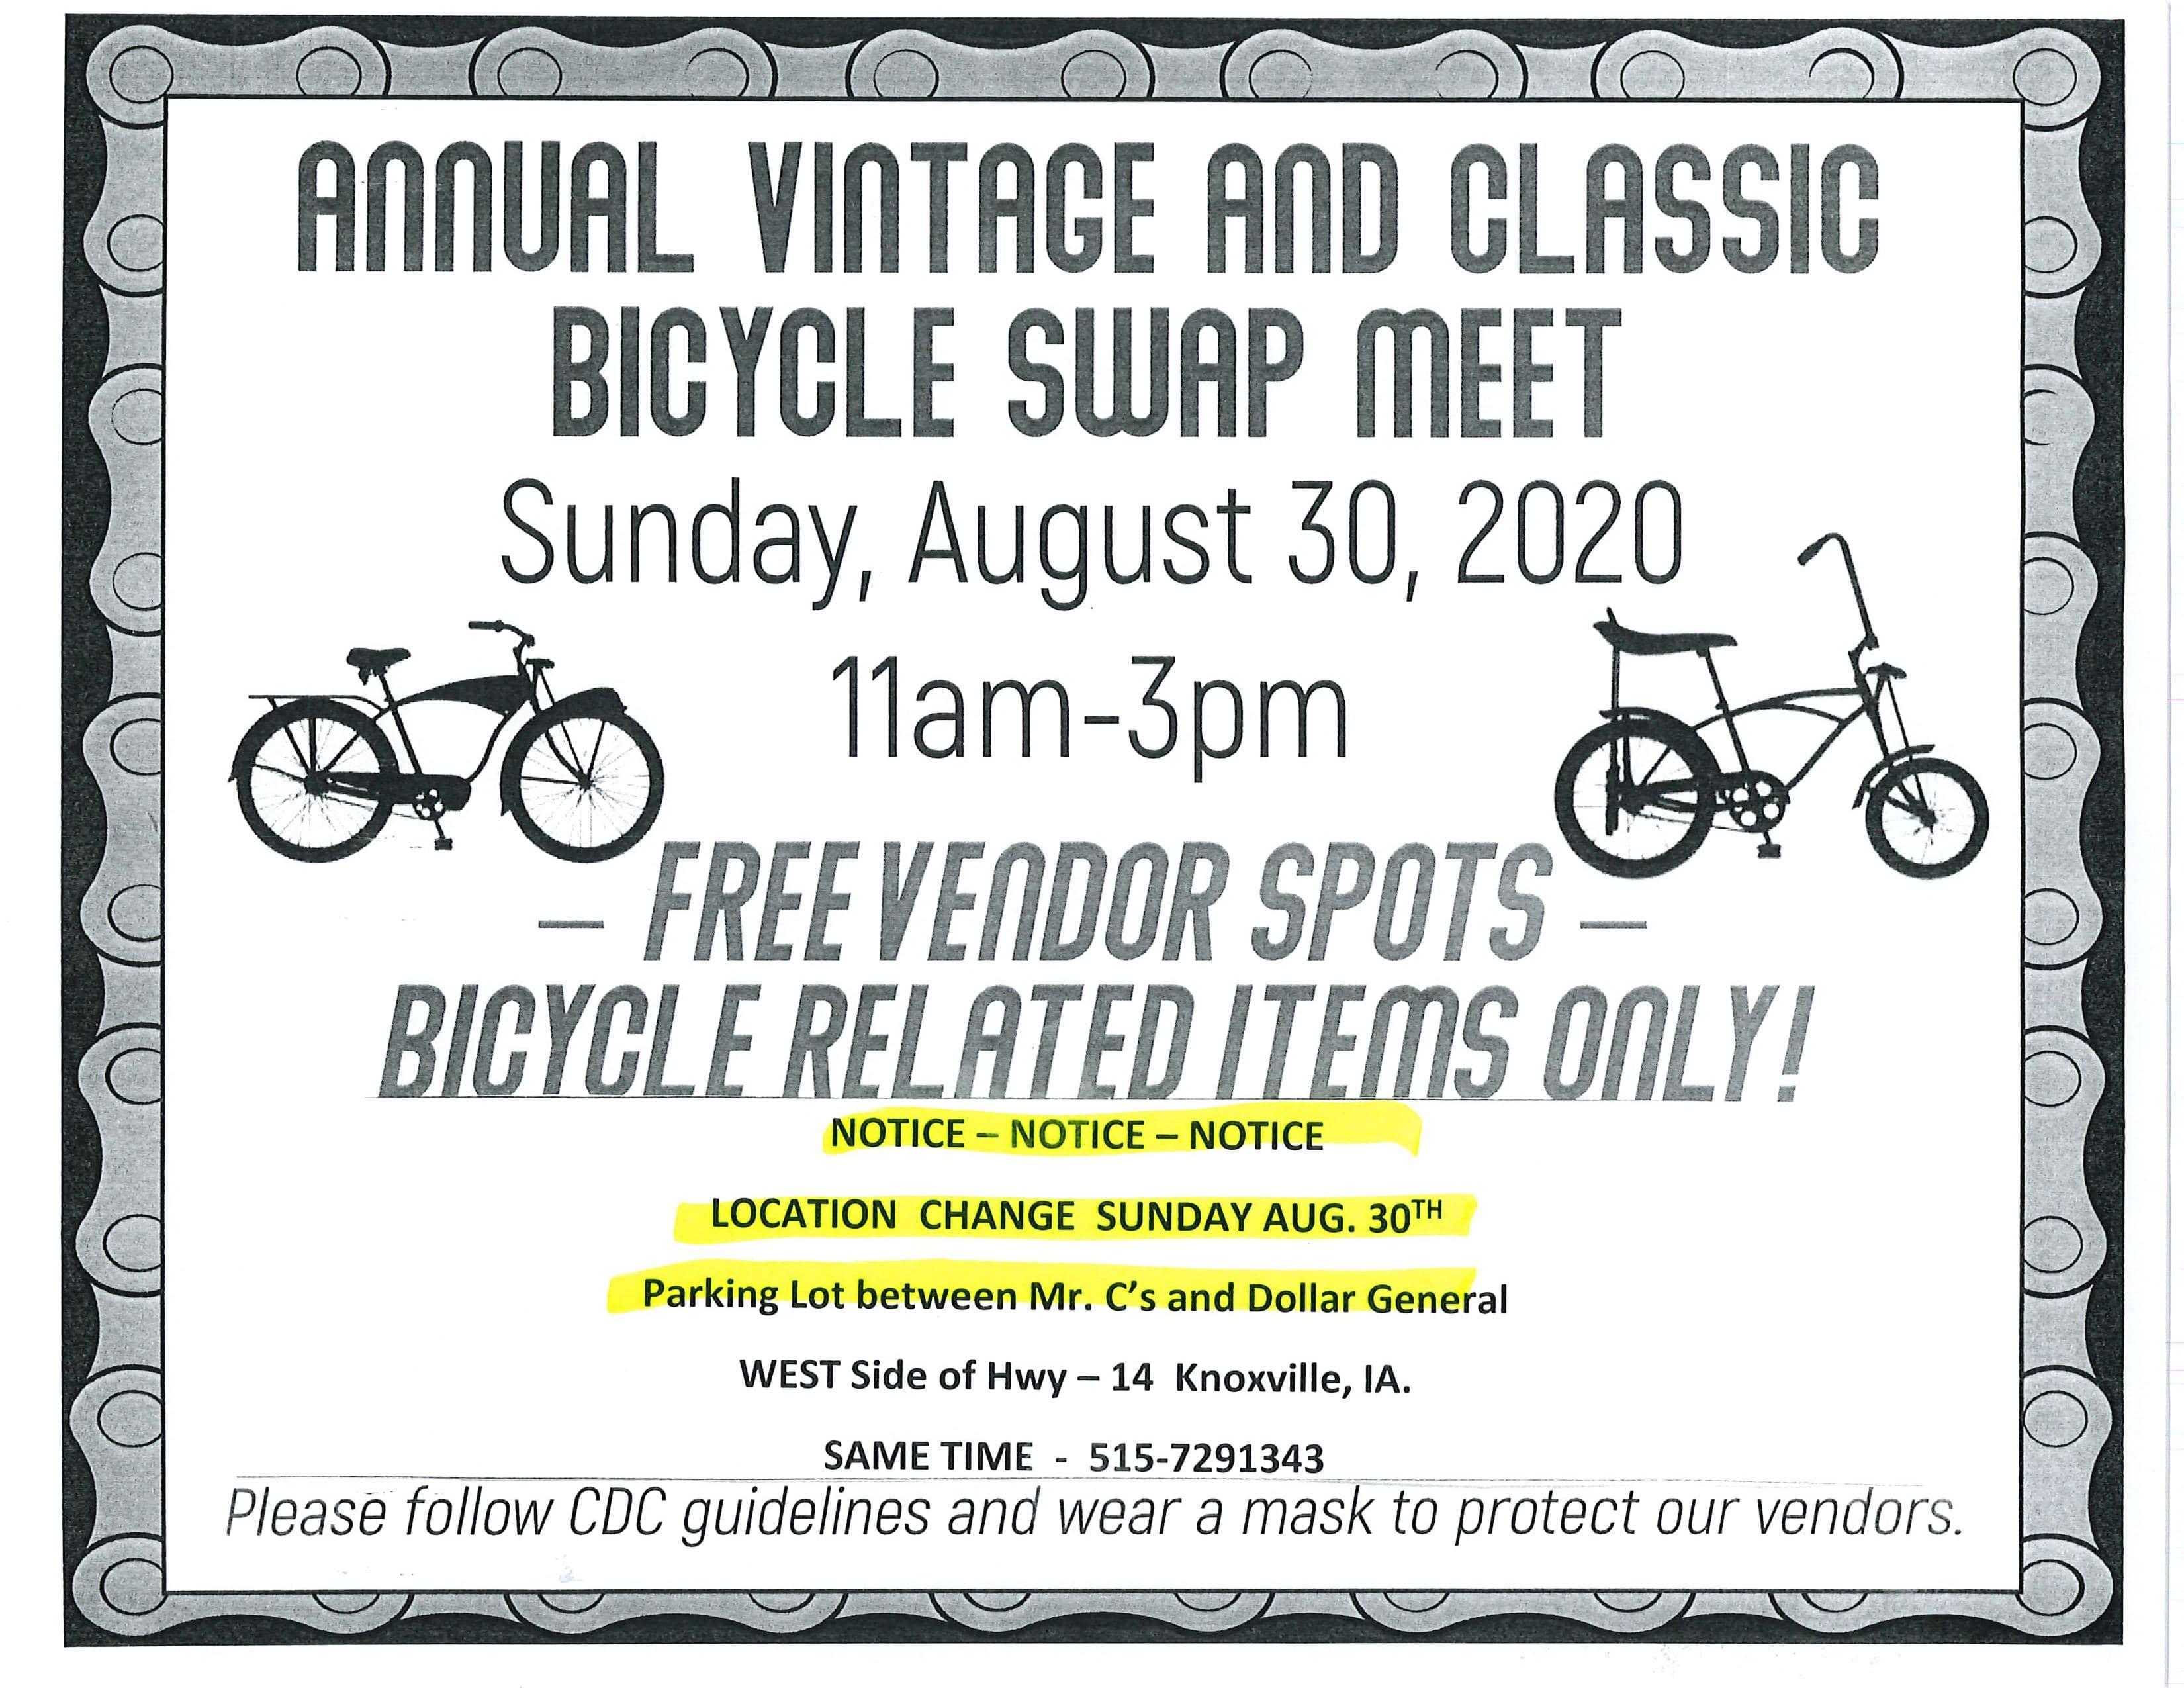 Central Iowa Vintage and Classic Bicycle Club Swap Meet Tomorrow | KNIA KRLS Radio